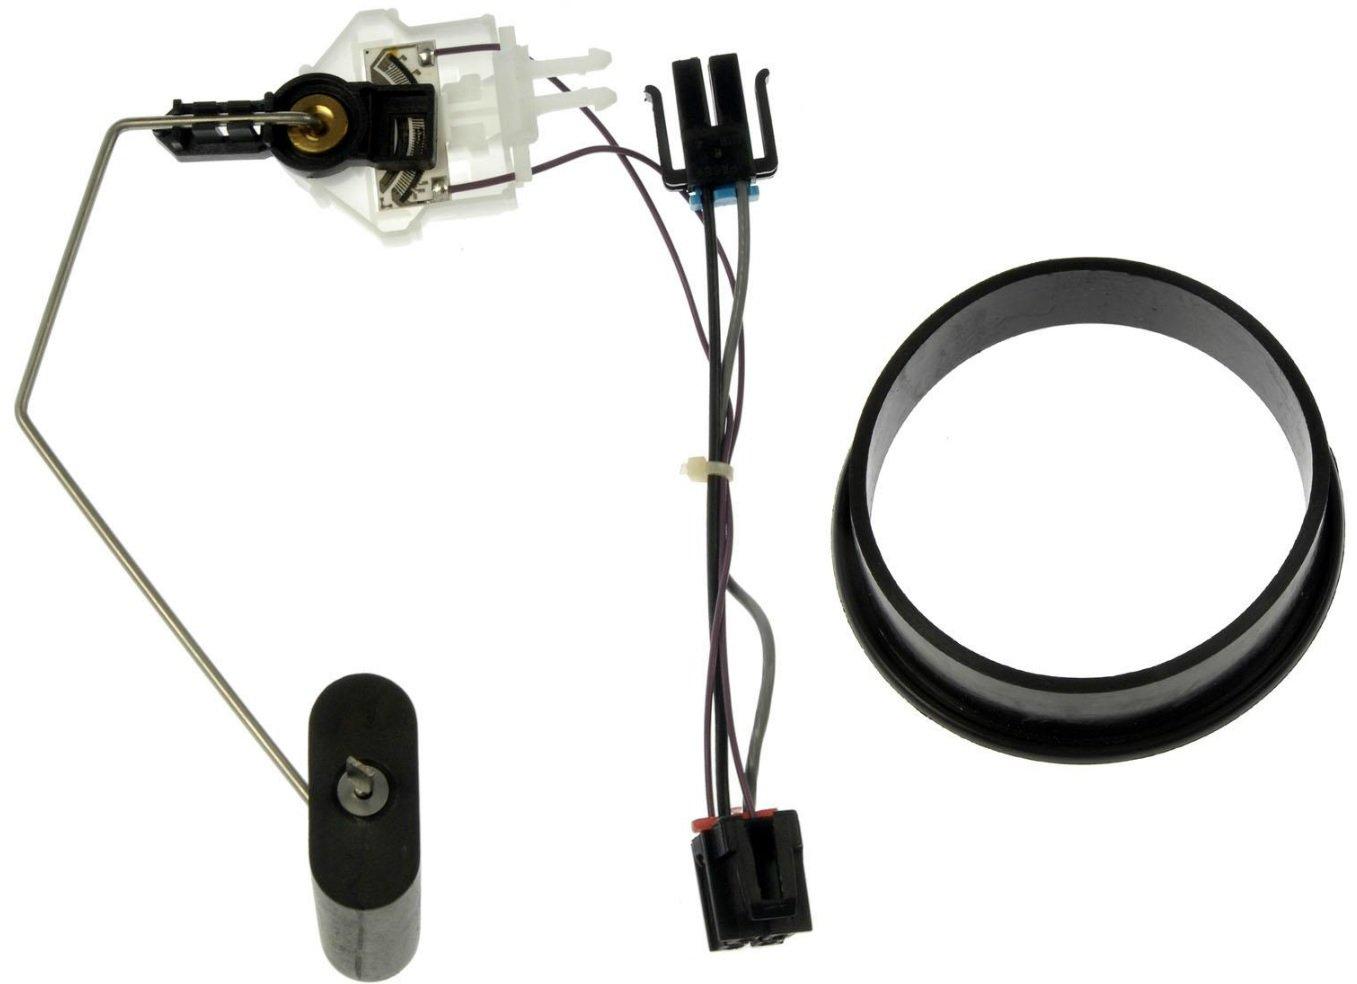 Apdty 022119 Fuel Gas Tank Level Sensor Sending Unit W Gm Wiring Harness Pump Seal Replaces 89060197 89060199 89060200 Sk1051 Automotive